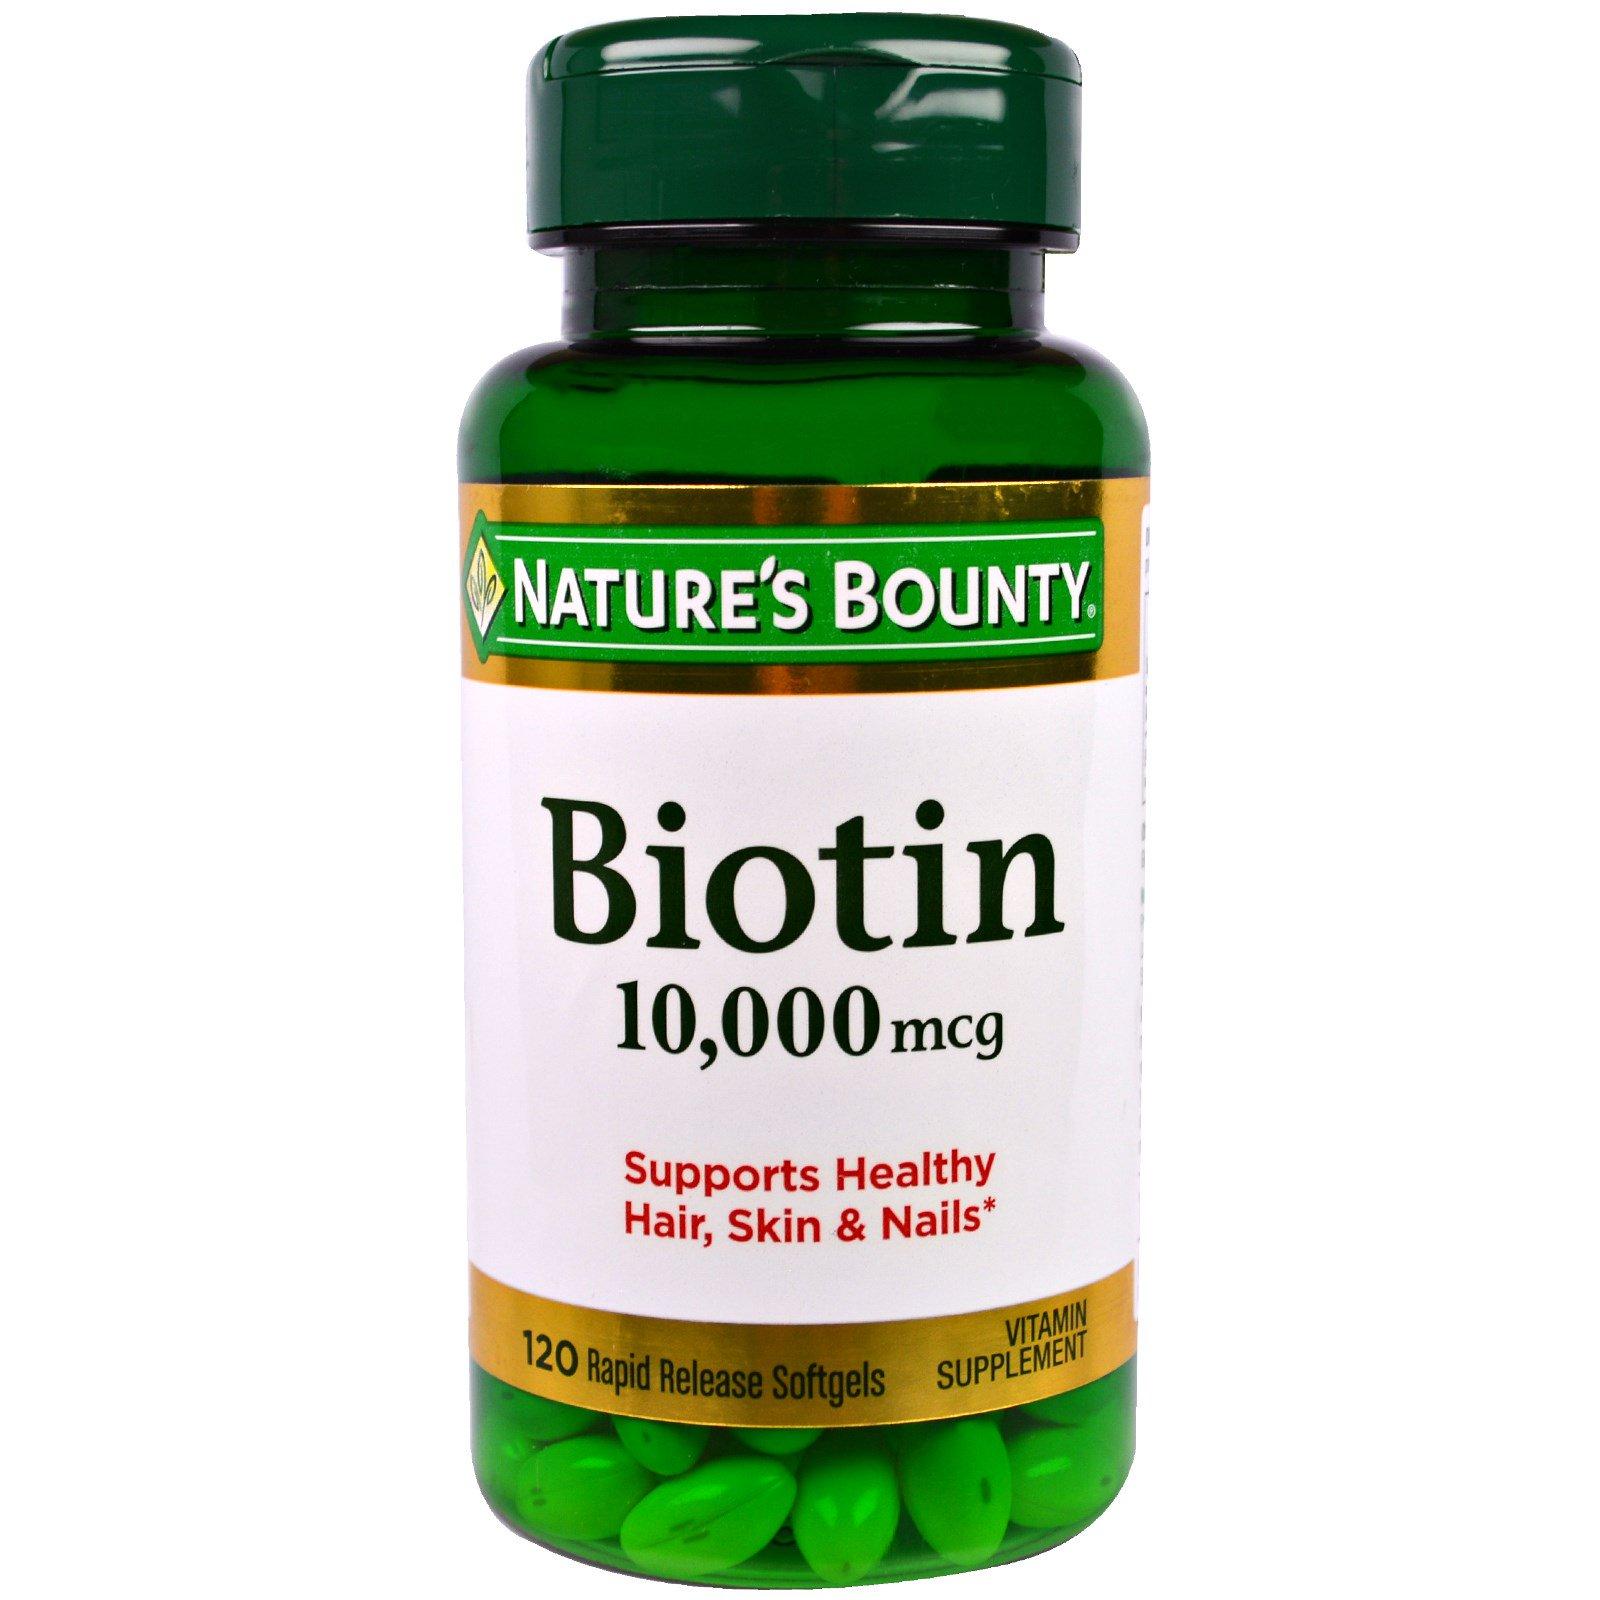 biotin bounty nature mcg softgels vitamins rapid release beauty natures supplements hair kardashian iherb growth health zoom courtesy